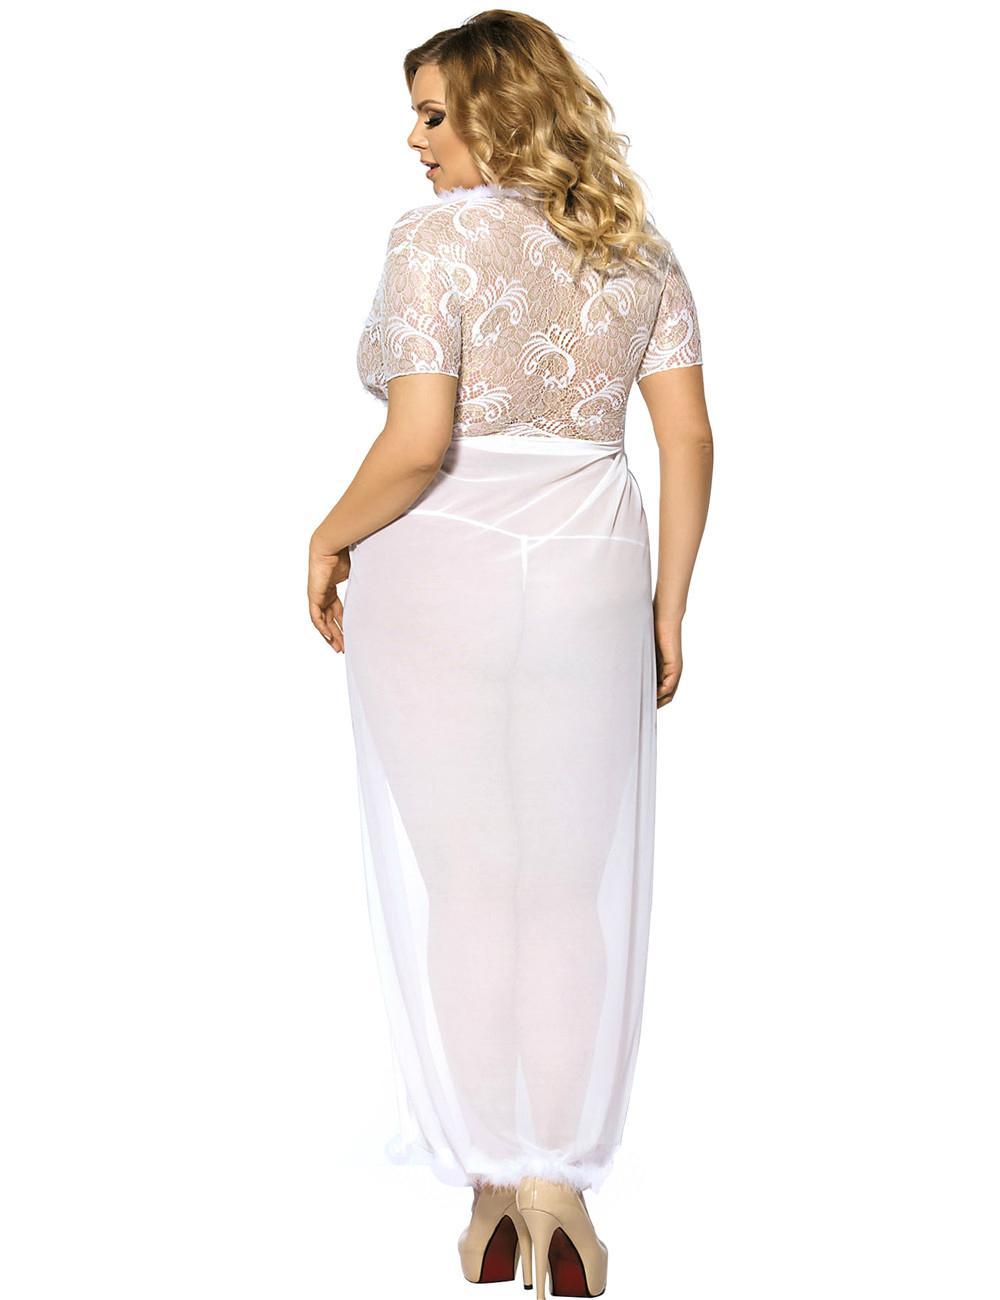 New fashion wholesalesexy nightwear sexy dress sexy lingerie 5